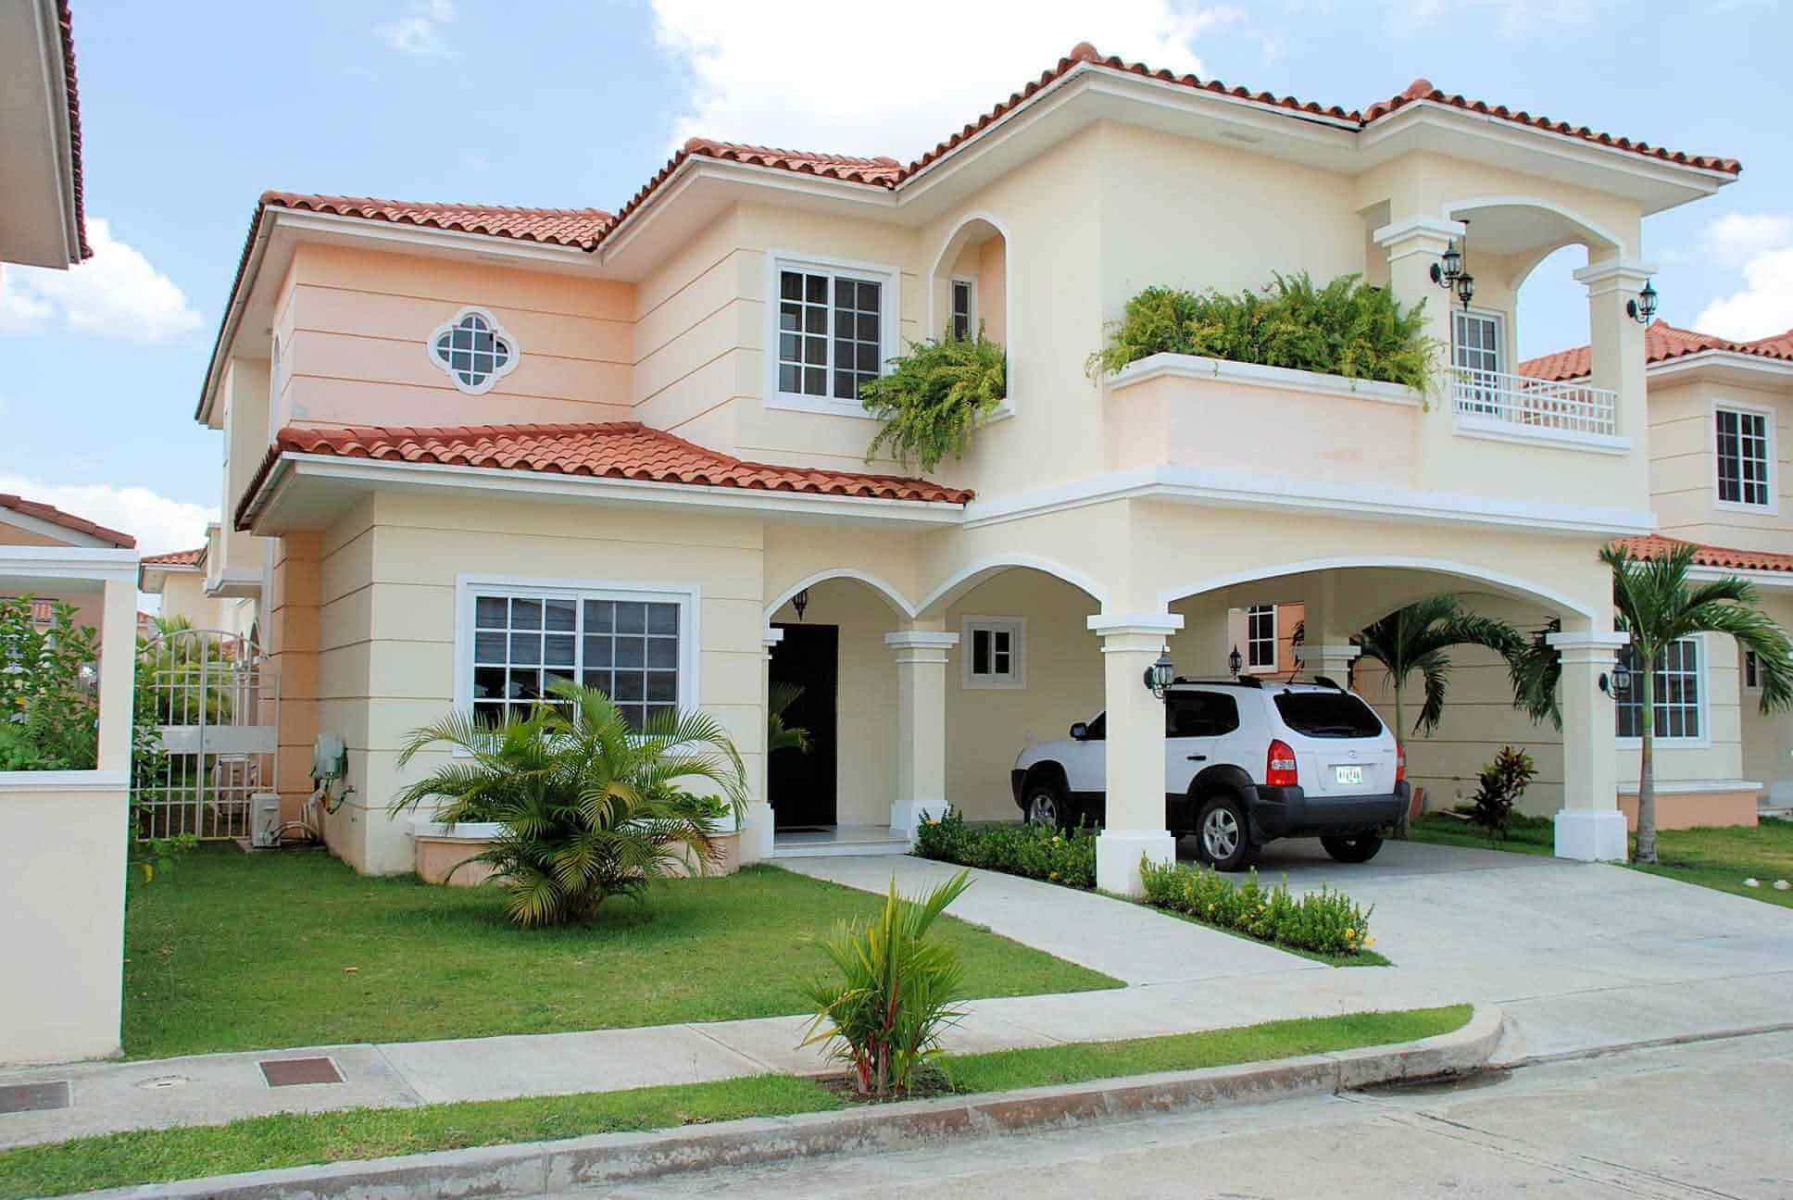 Alquiler de casas en panam casas panam for Casas para alquilar